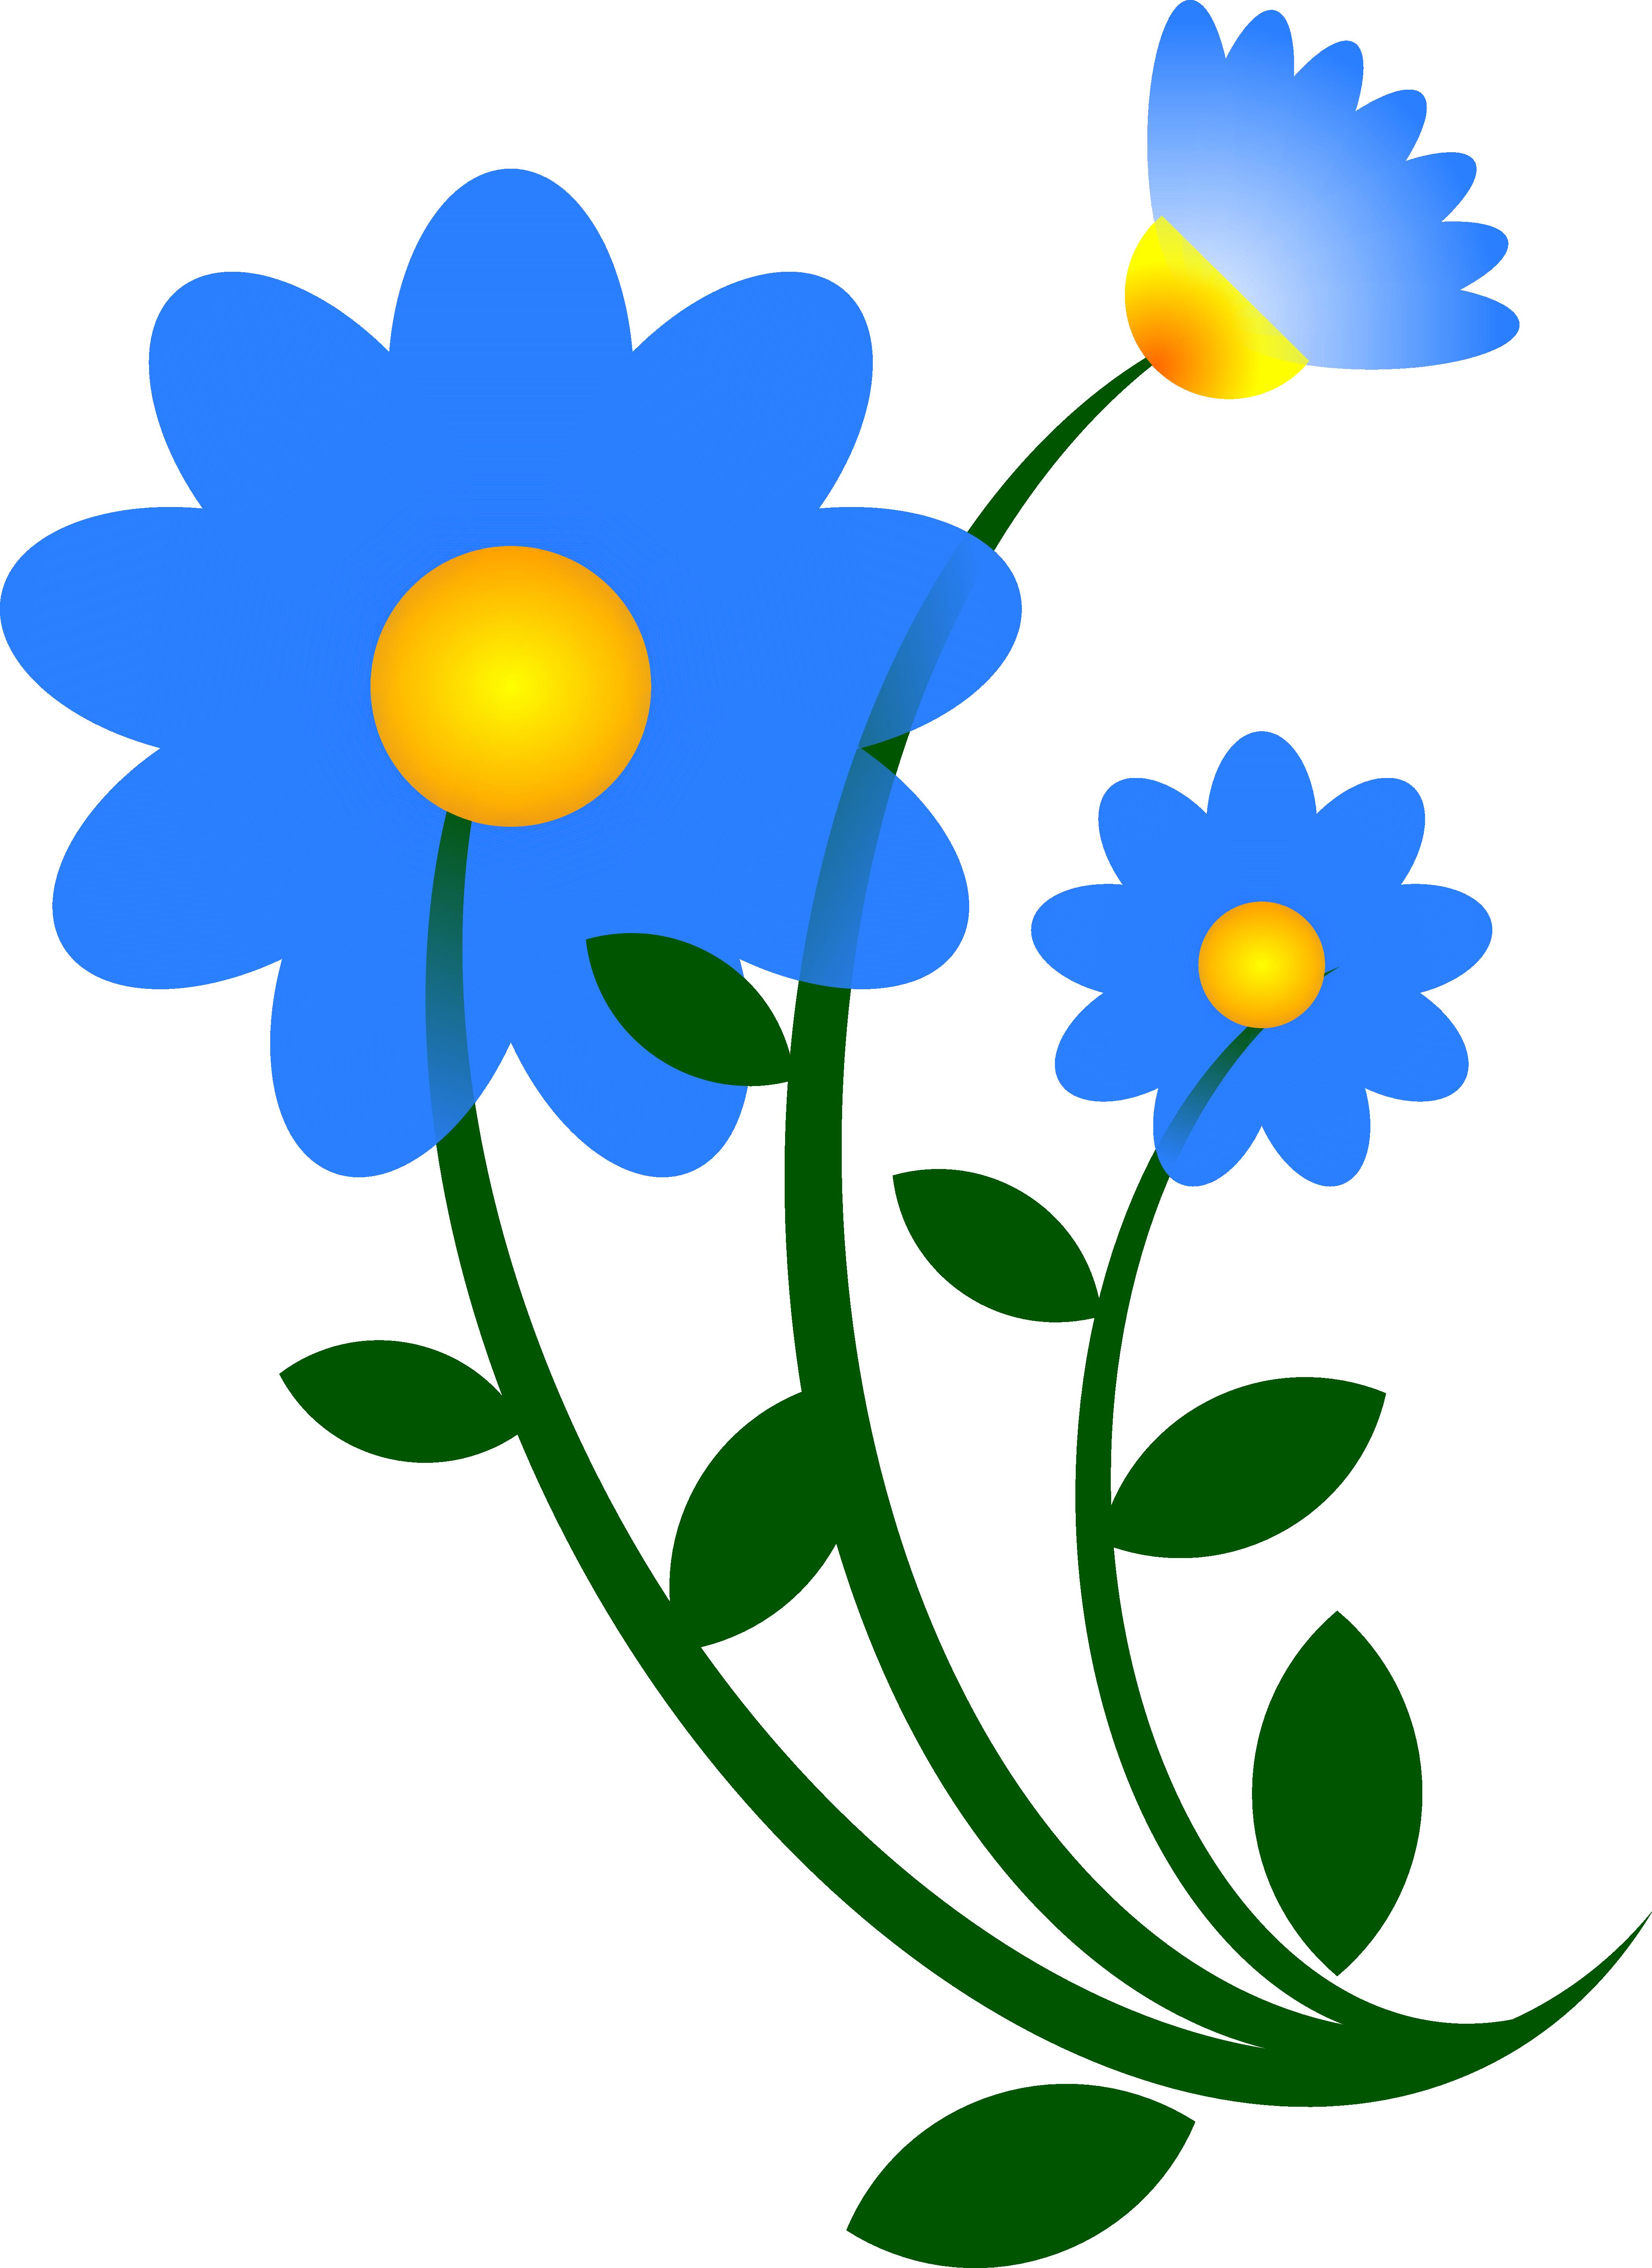 Flower Png - ClipArt Best